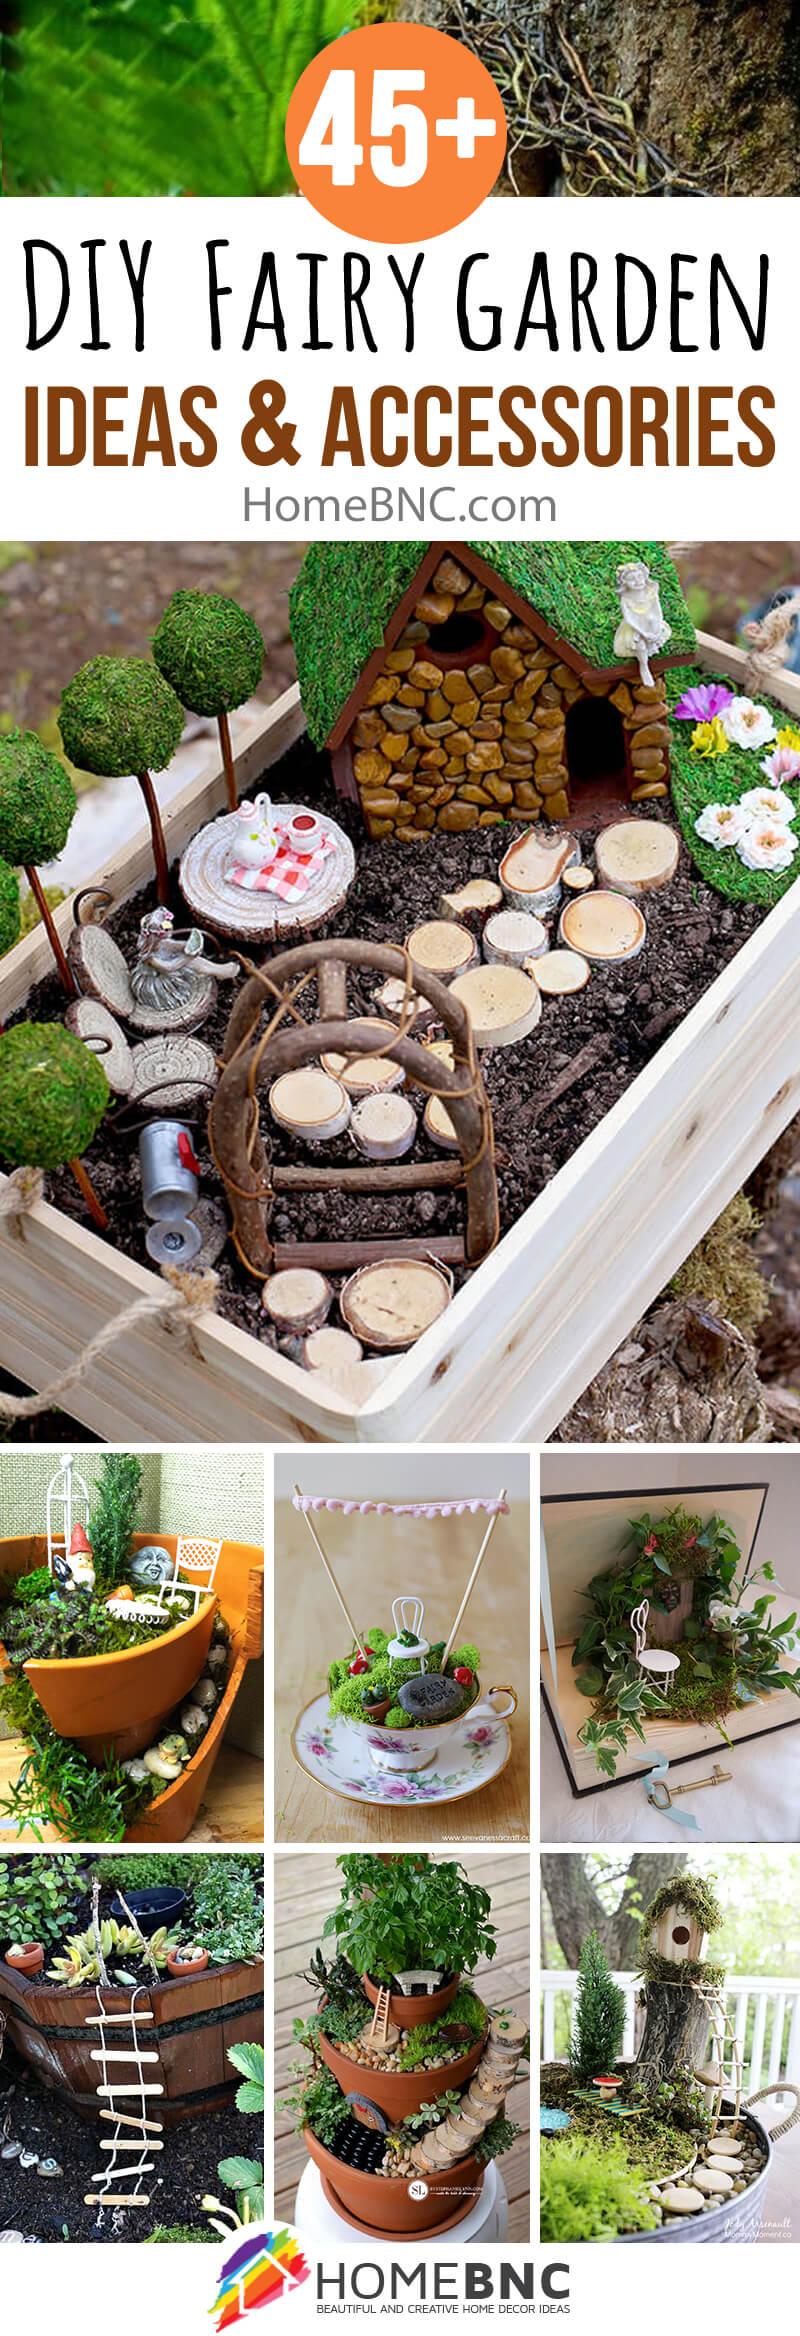 DIY Fairy Garden Accessories